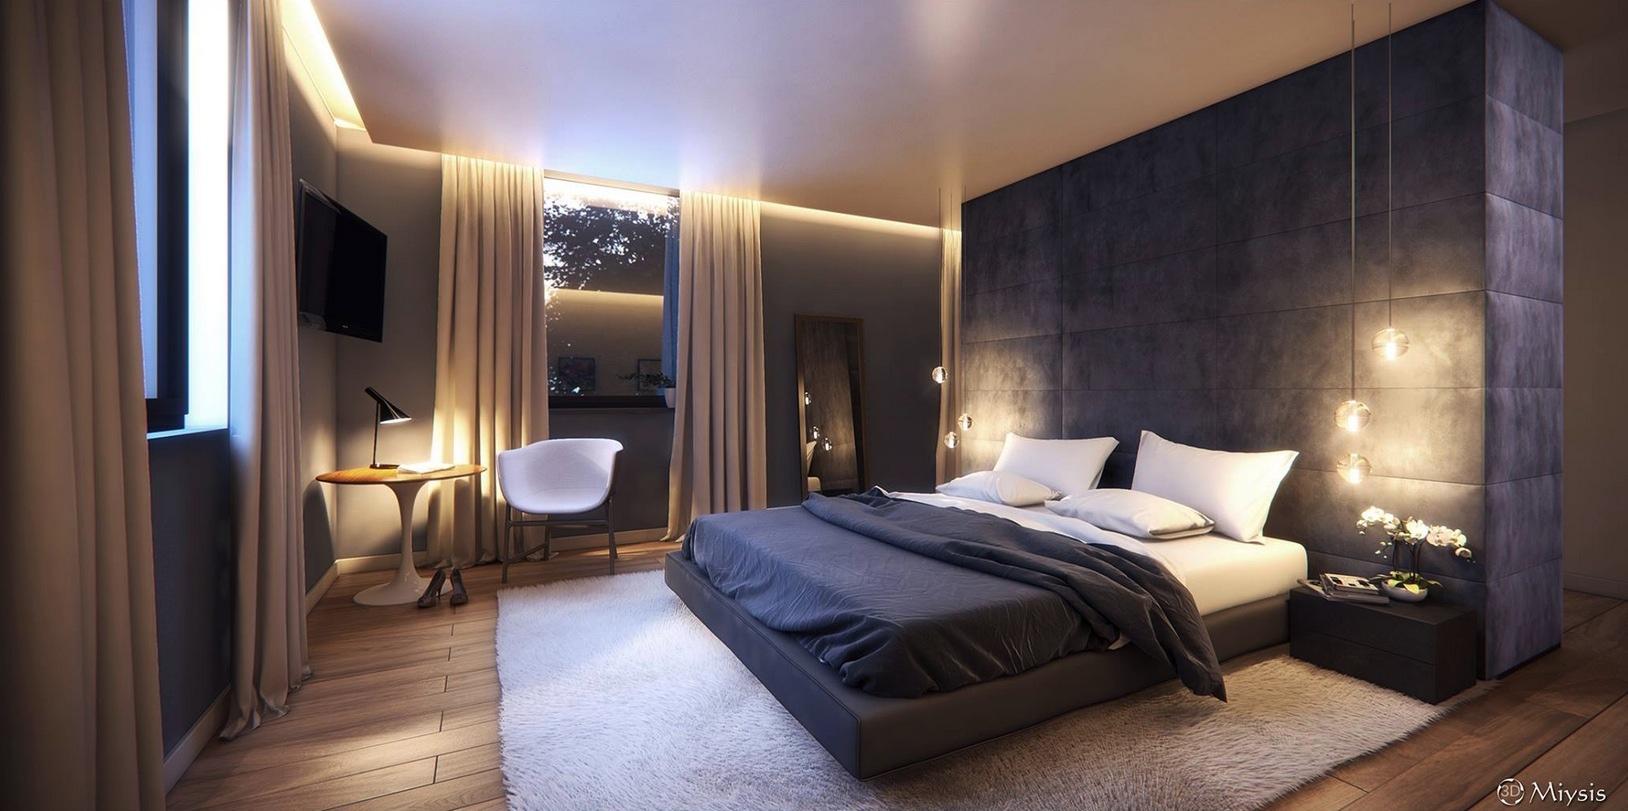 Modern bedrooms 20 modern bedroom designs QWIRJNS